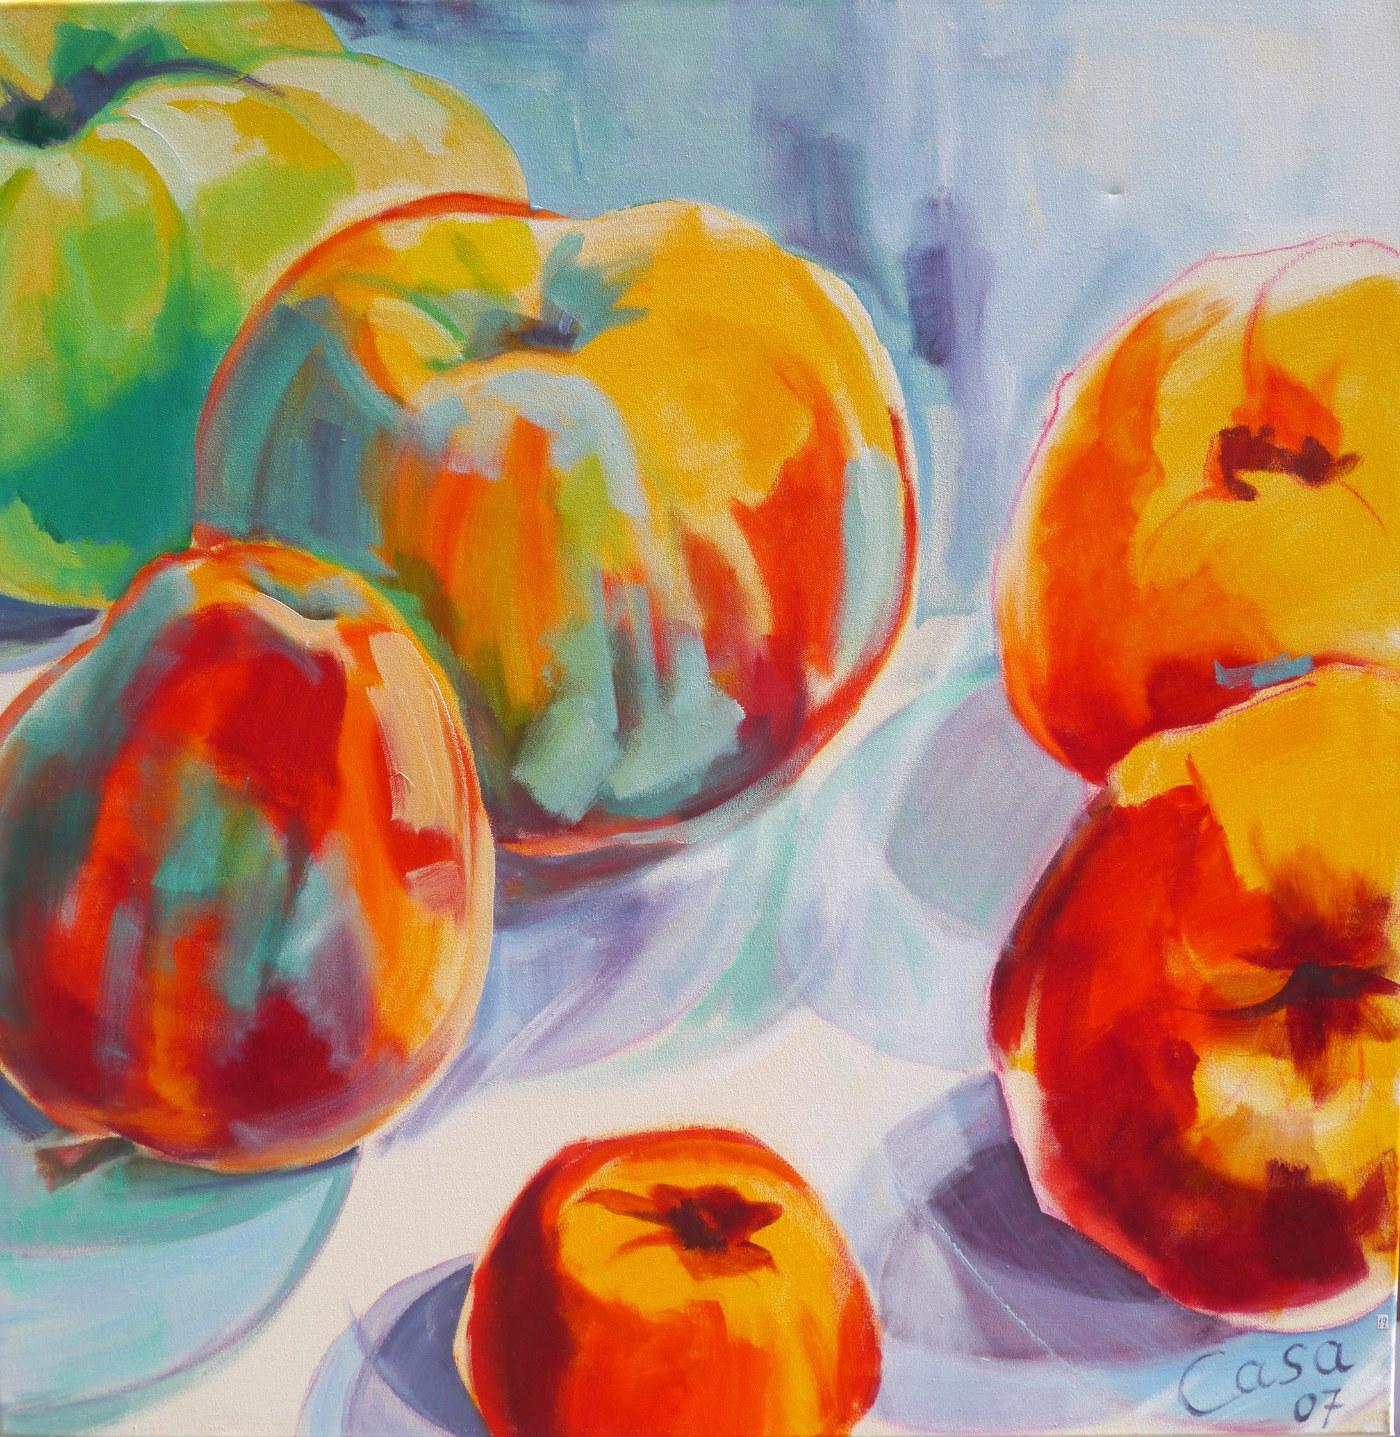 Sechs Äpfel - Acryl auf Leinwand - 100 x 100 cm